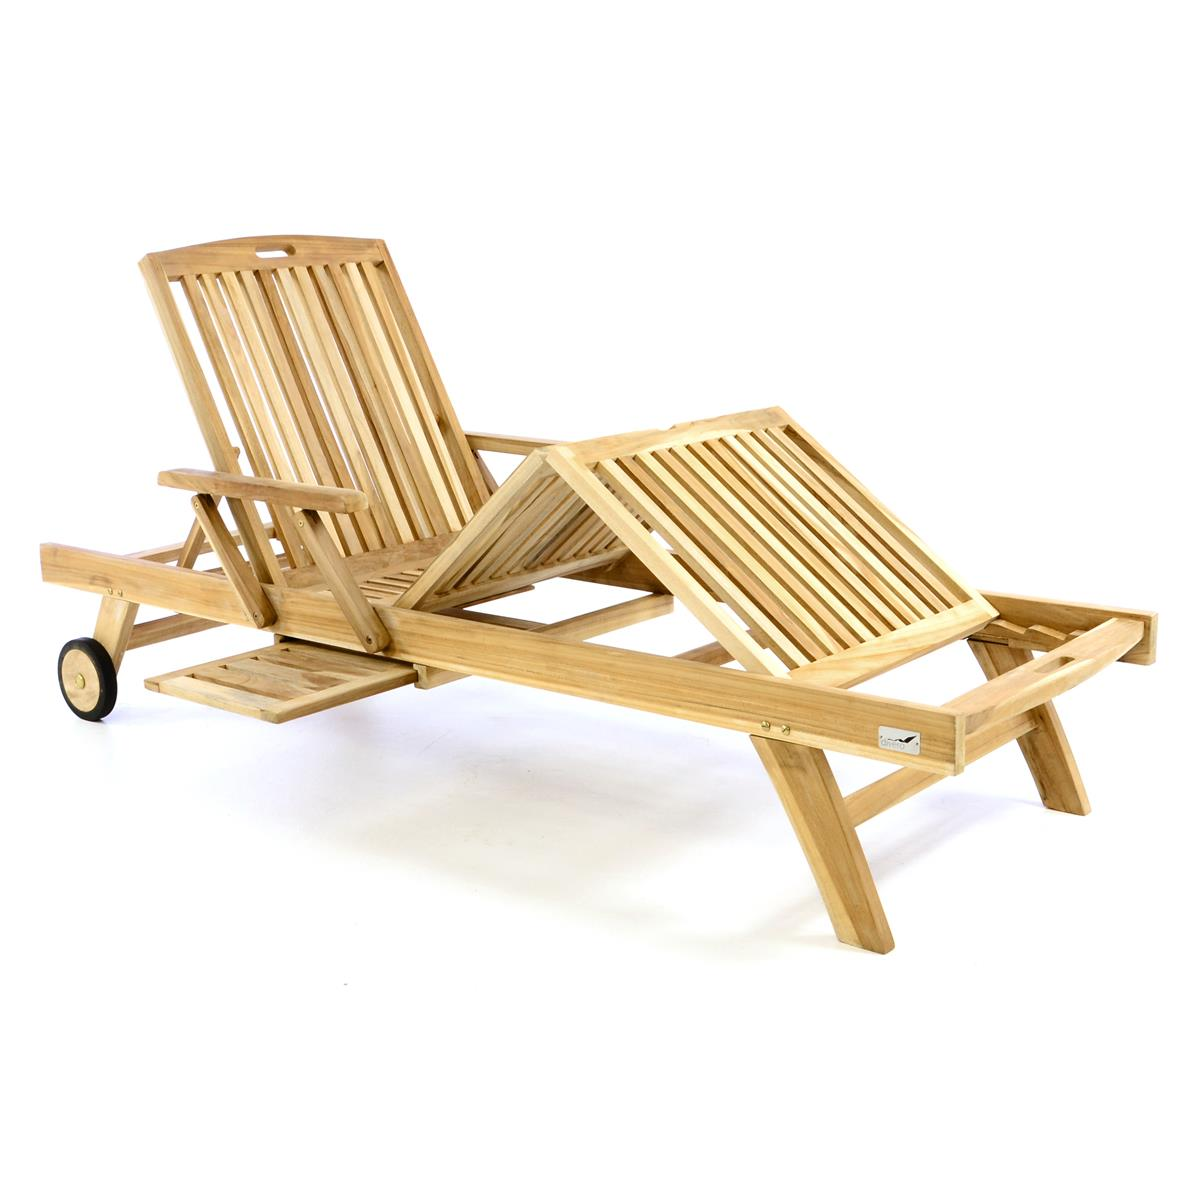 DIVERO Sonnenliege Garten Relax - Liege Teak - Holz inkl. Räder Tablett natur